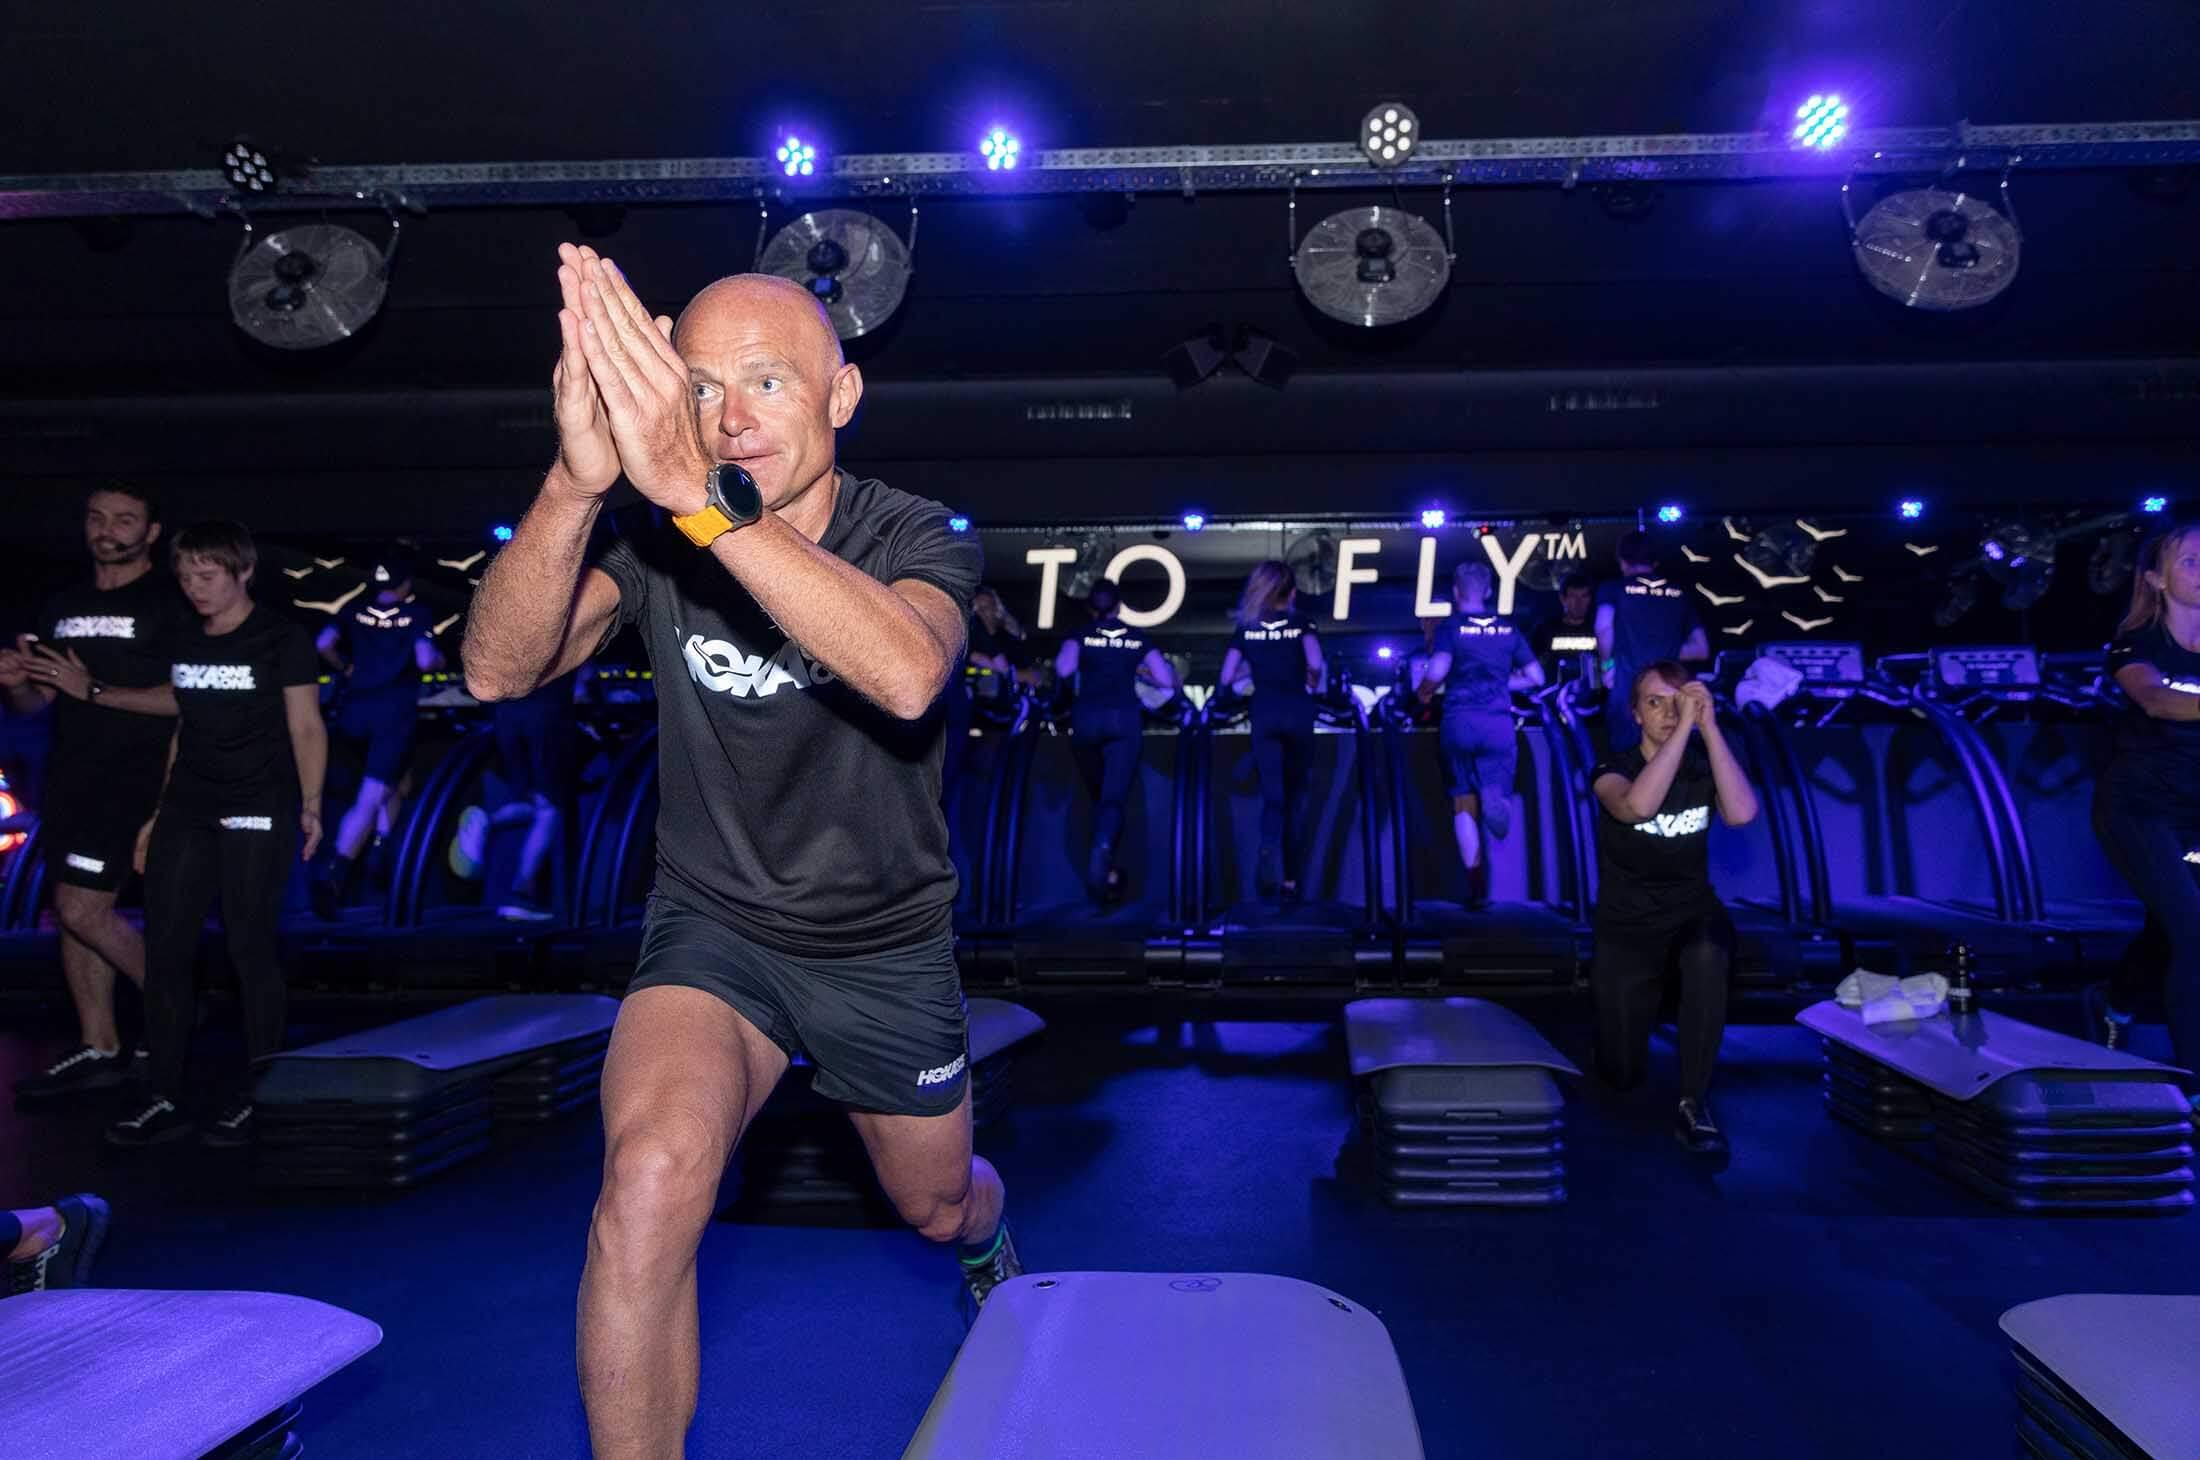 HOKA co-founder Nico Mermoud leads the Fly at Night fitness class